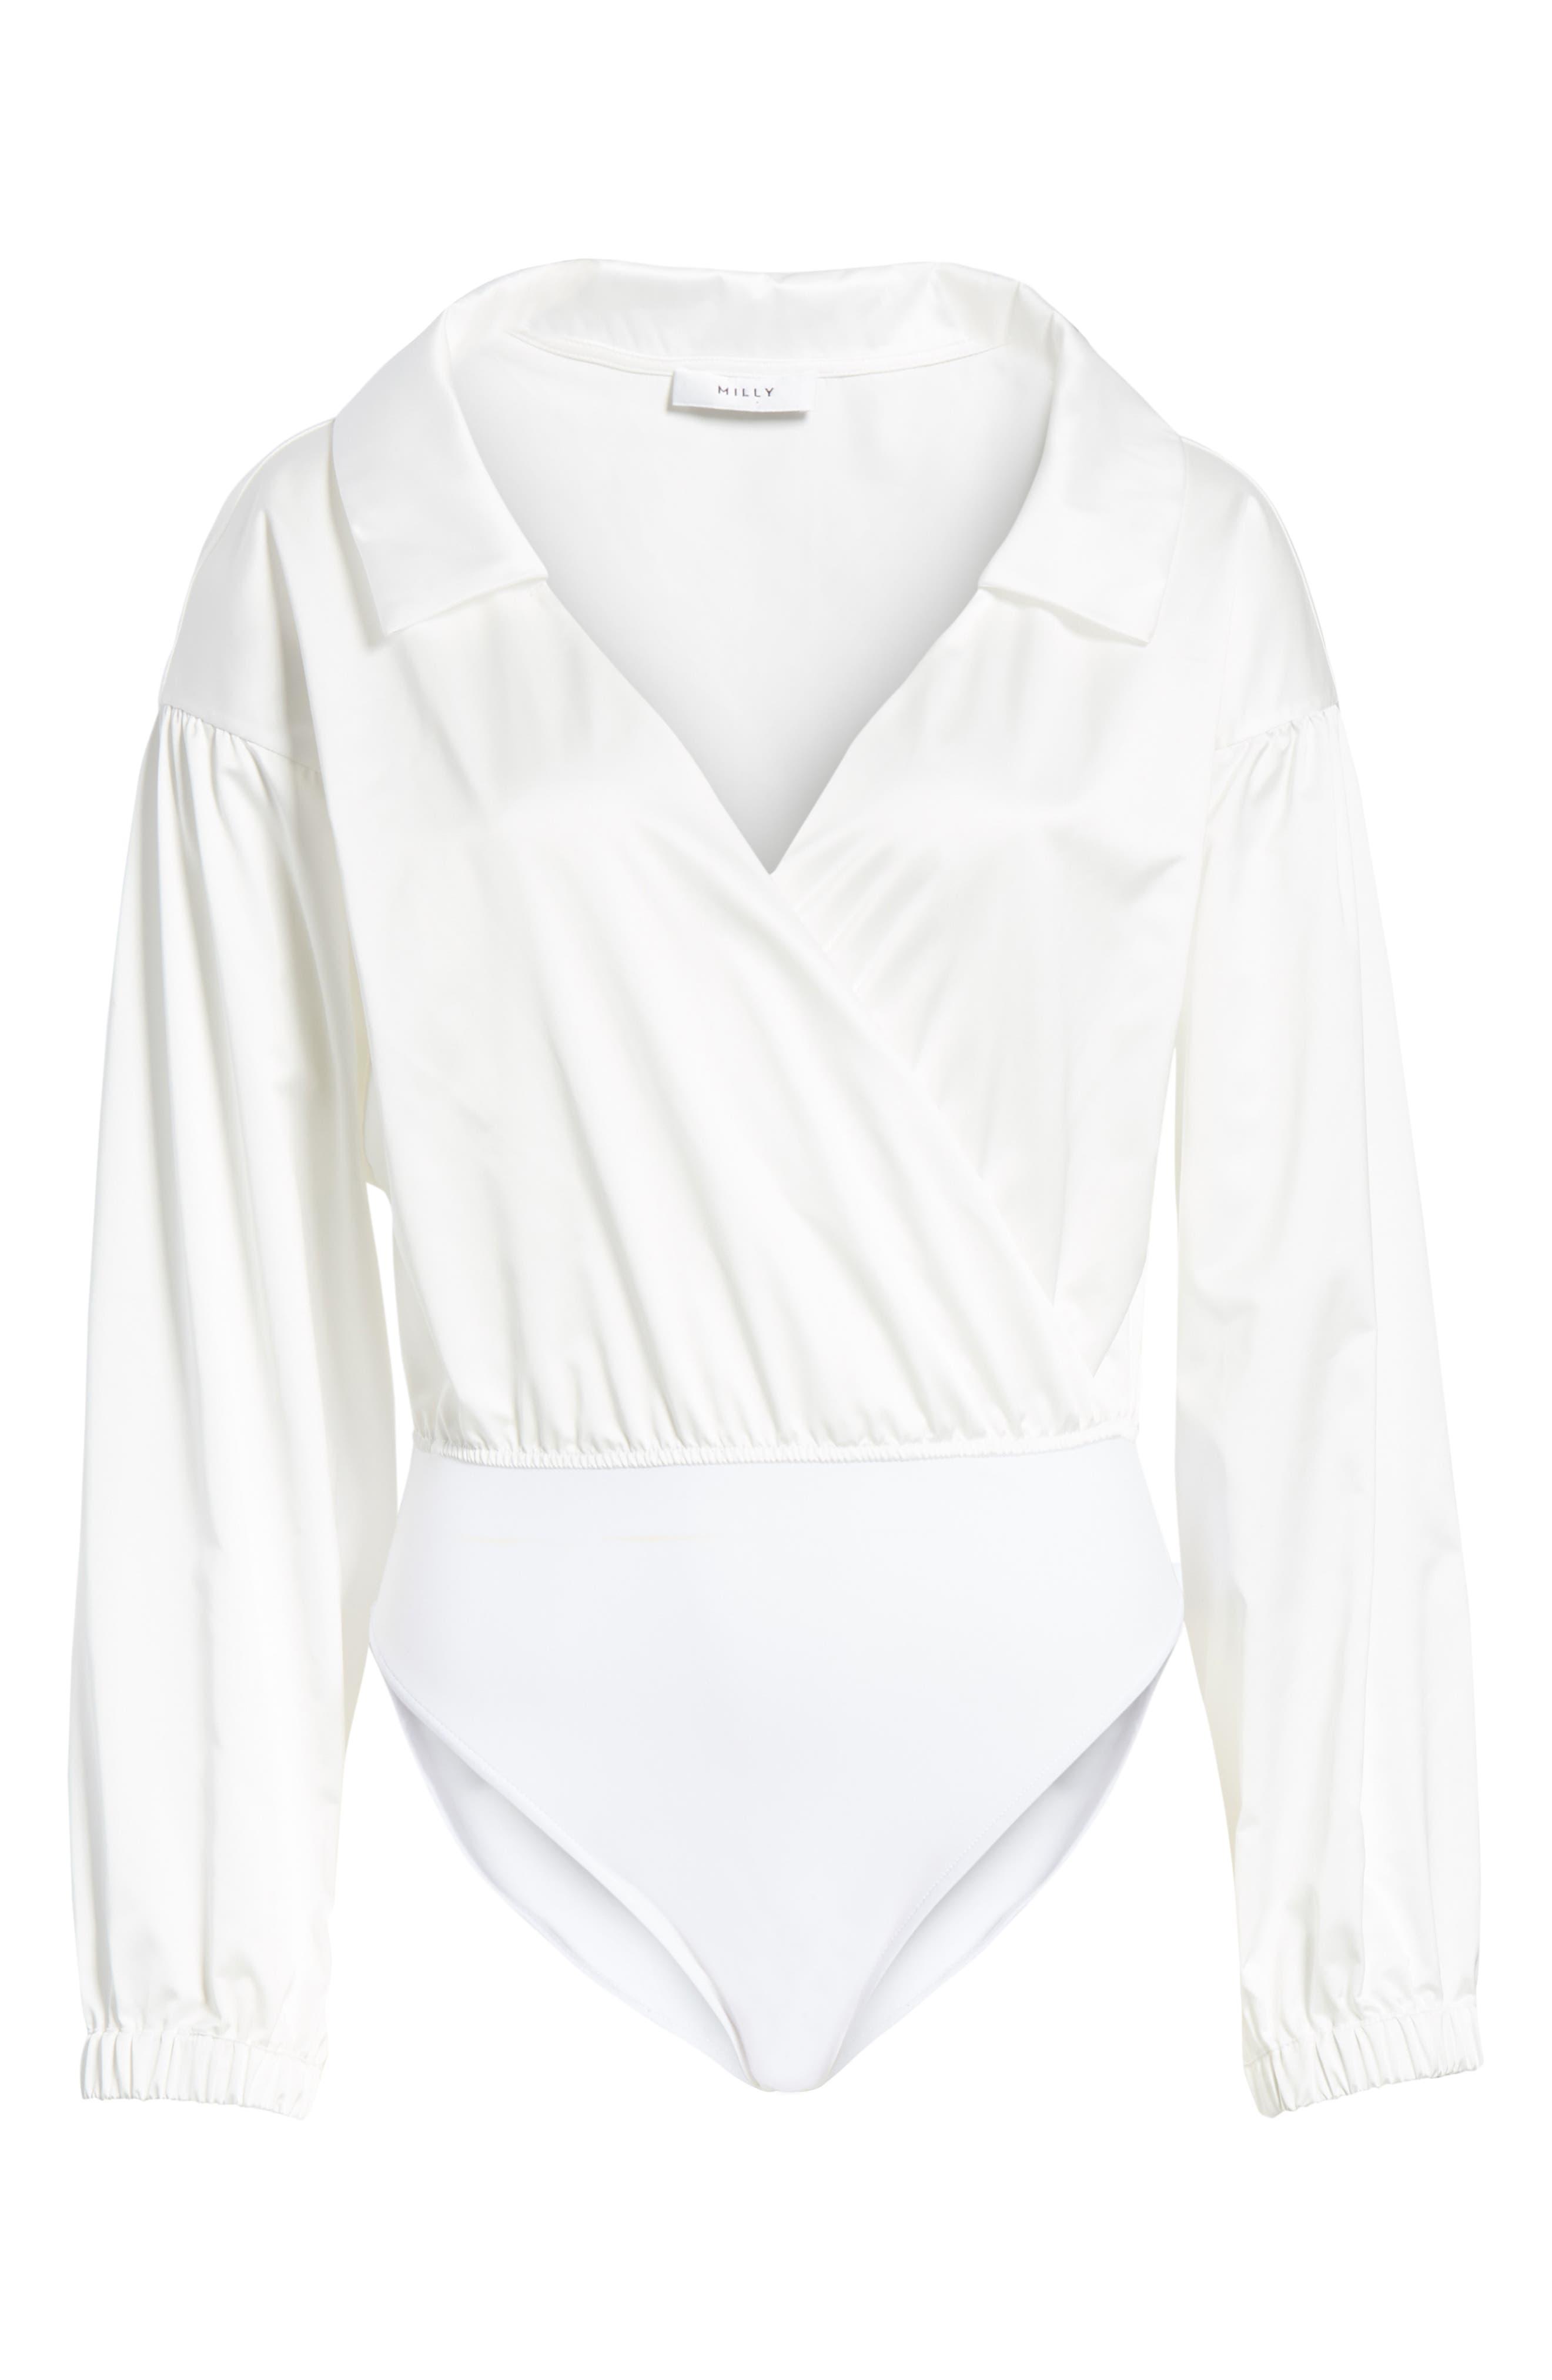 MILLY,                             Italian Duchess Taffeta Wrap Top Bodysuit,                             Alternate thumbnail 6, color,                             150